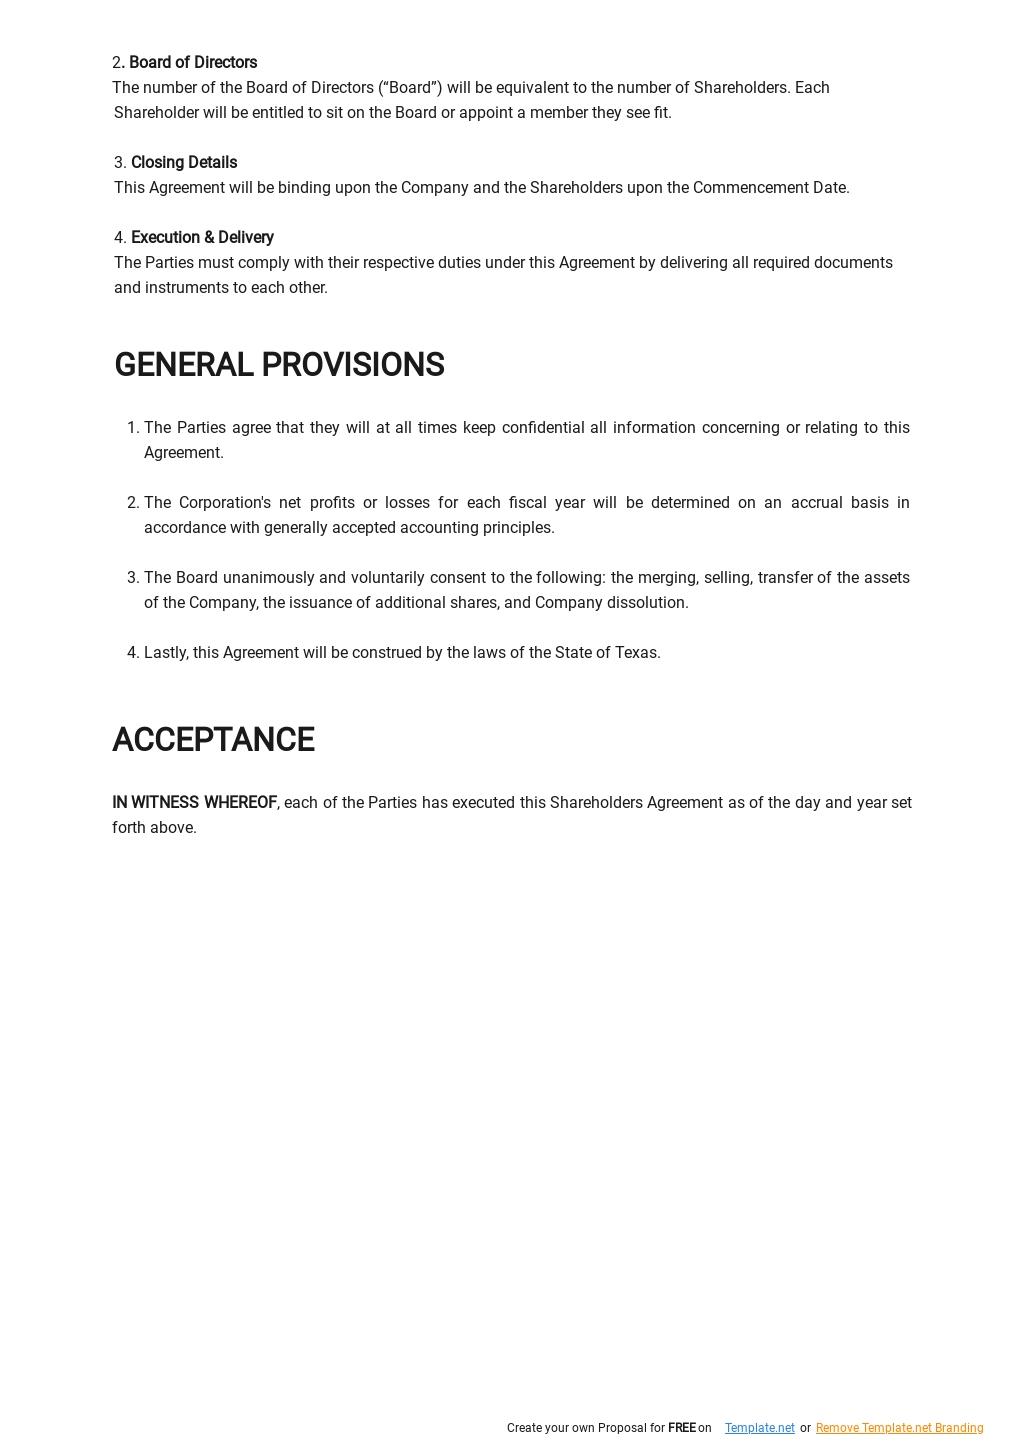 Shareholders Agreement Template 2.jpe